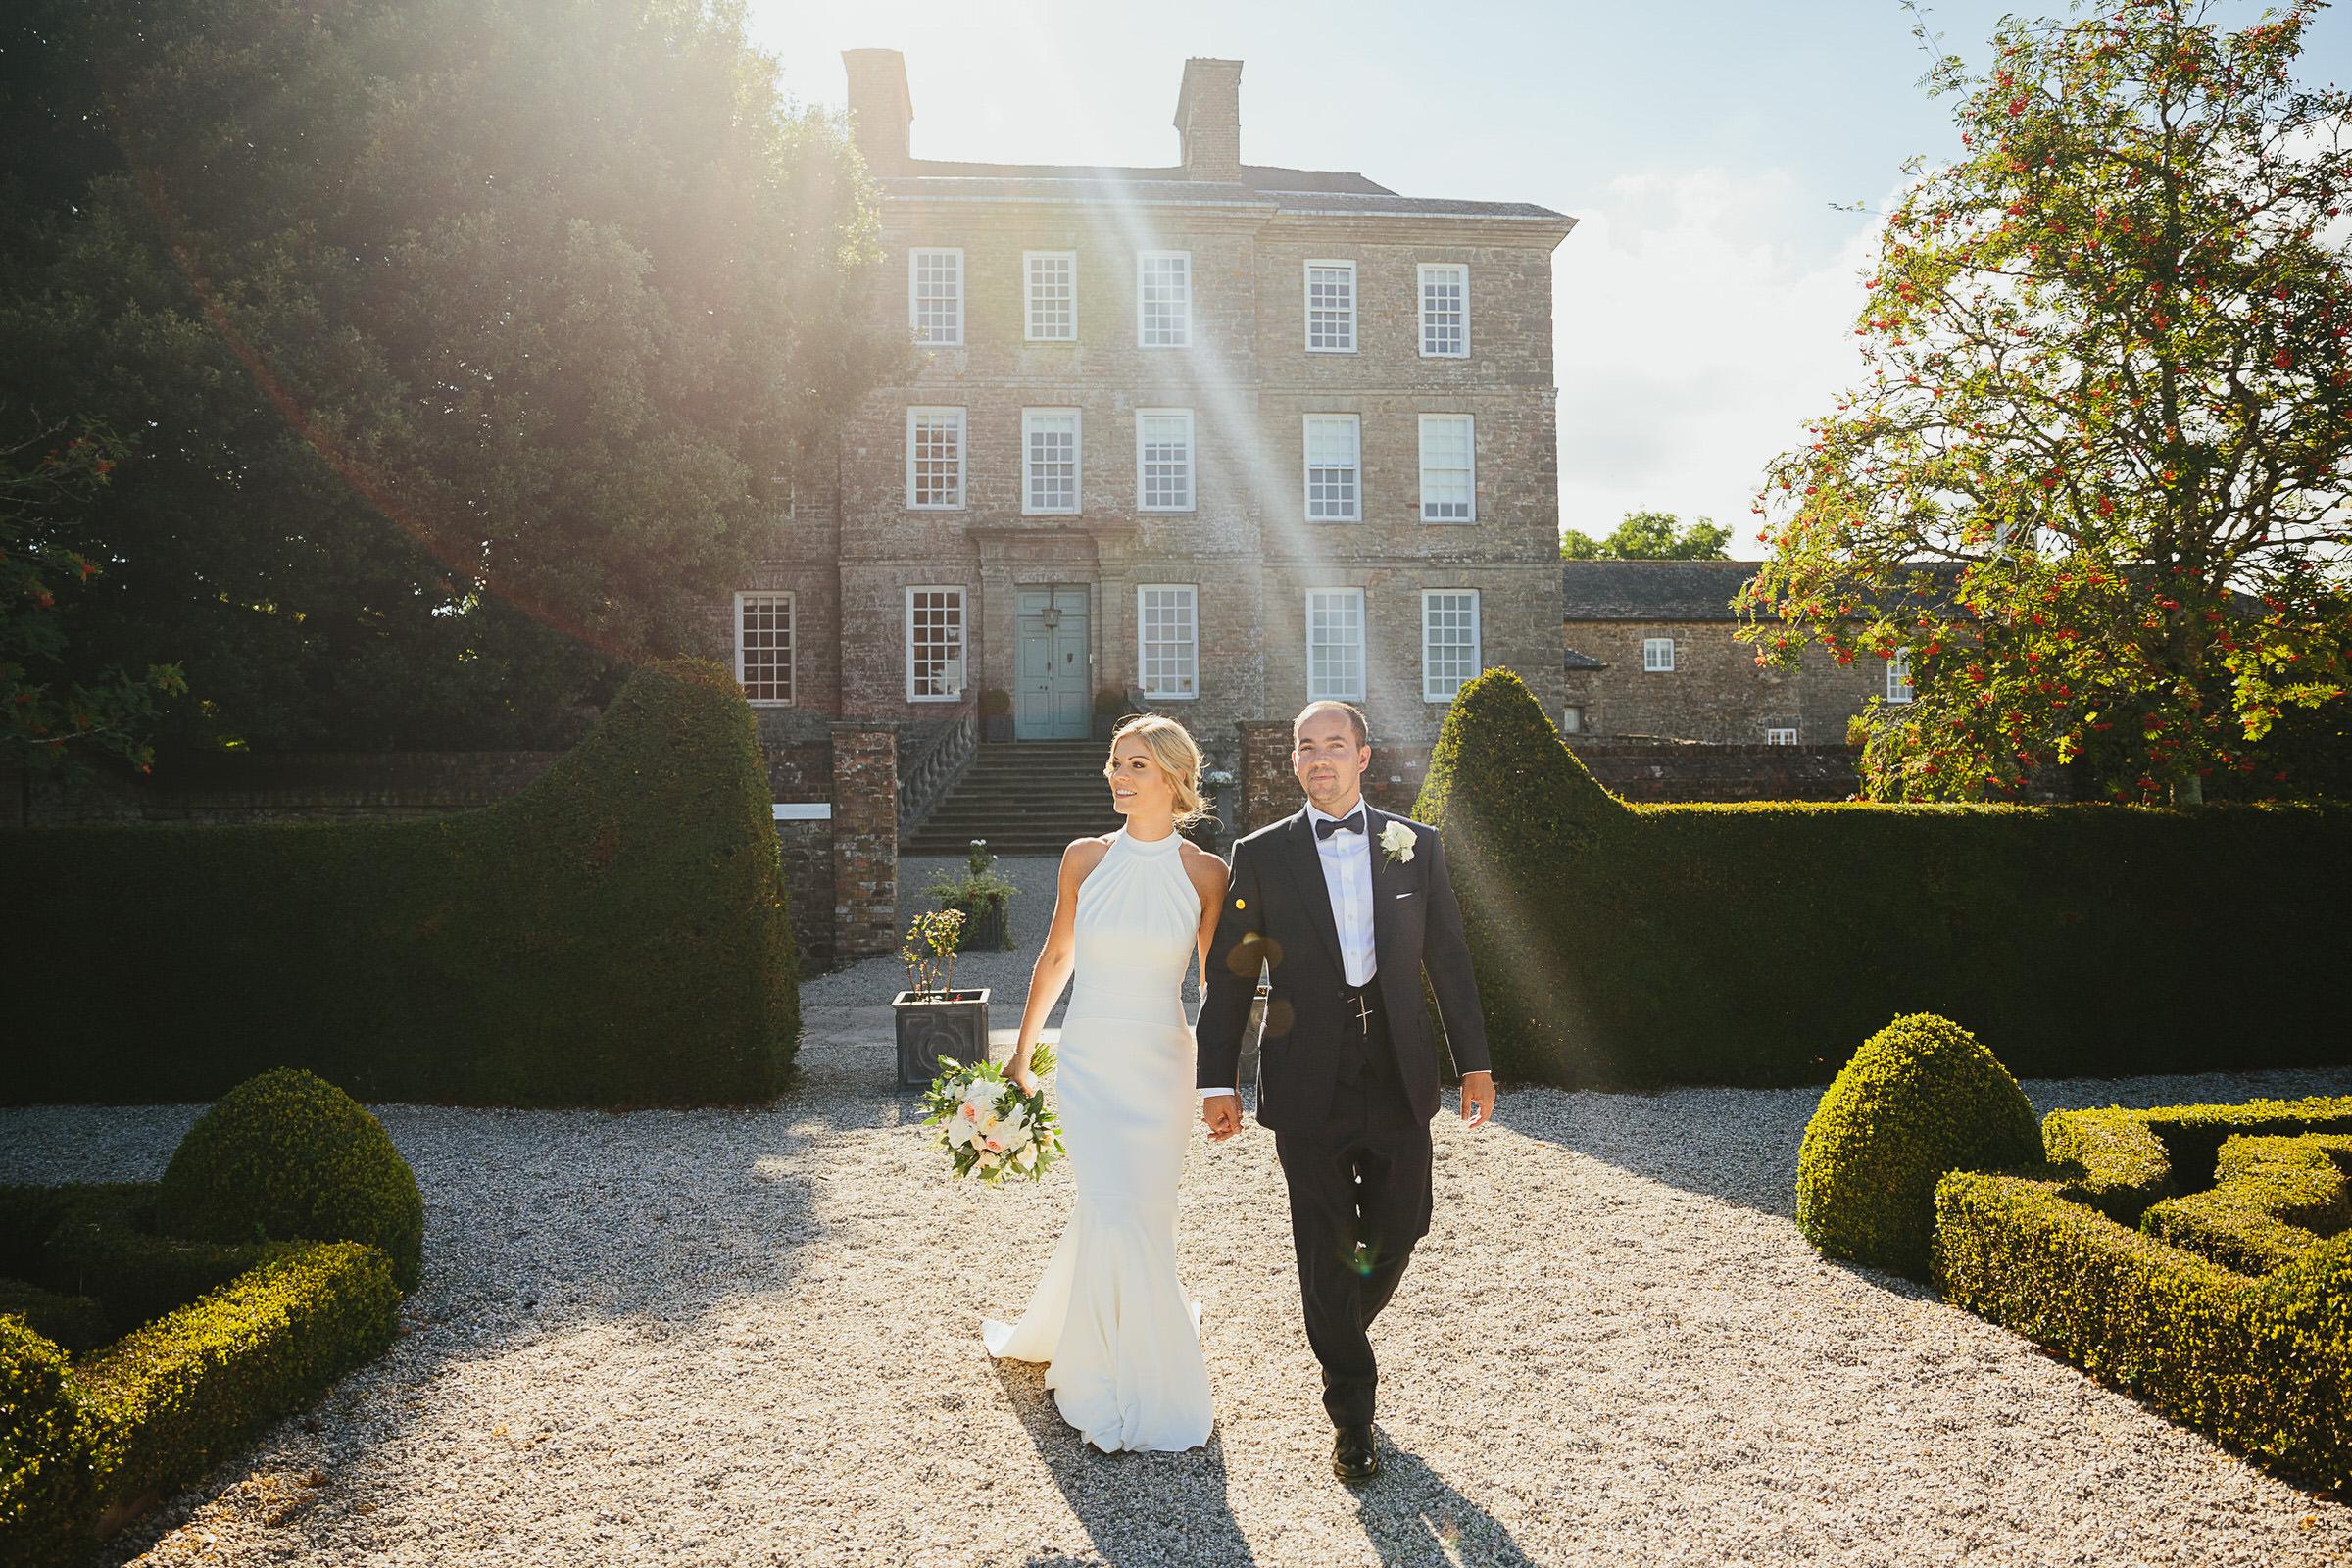 Devon stately home wedding venue